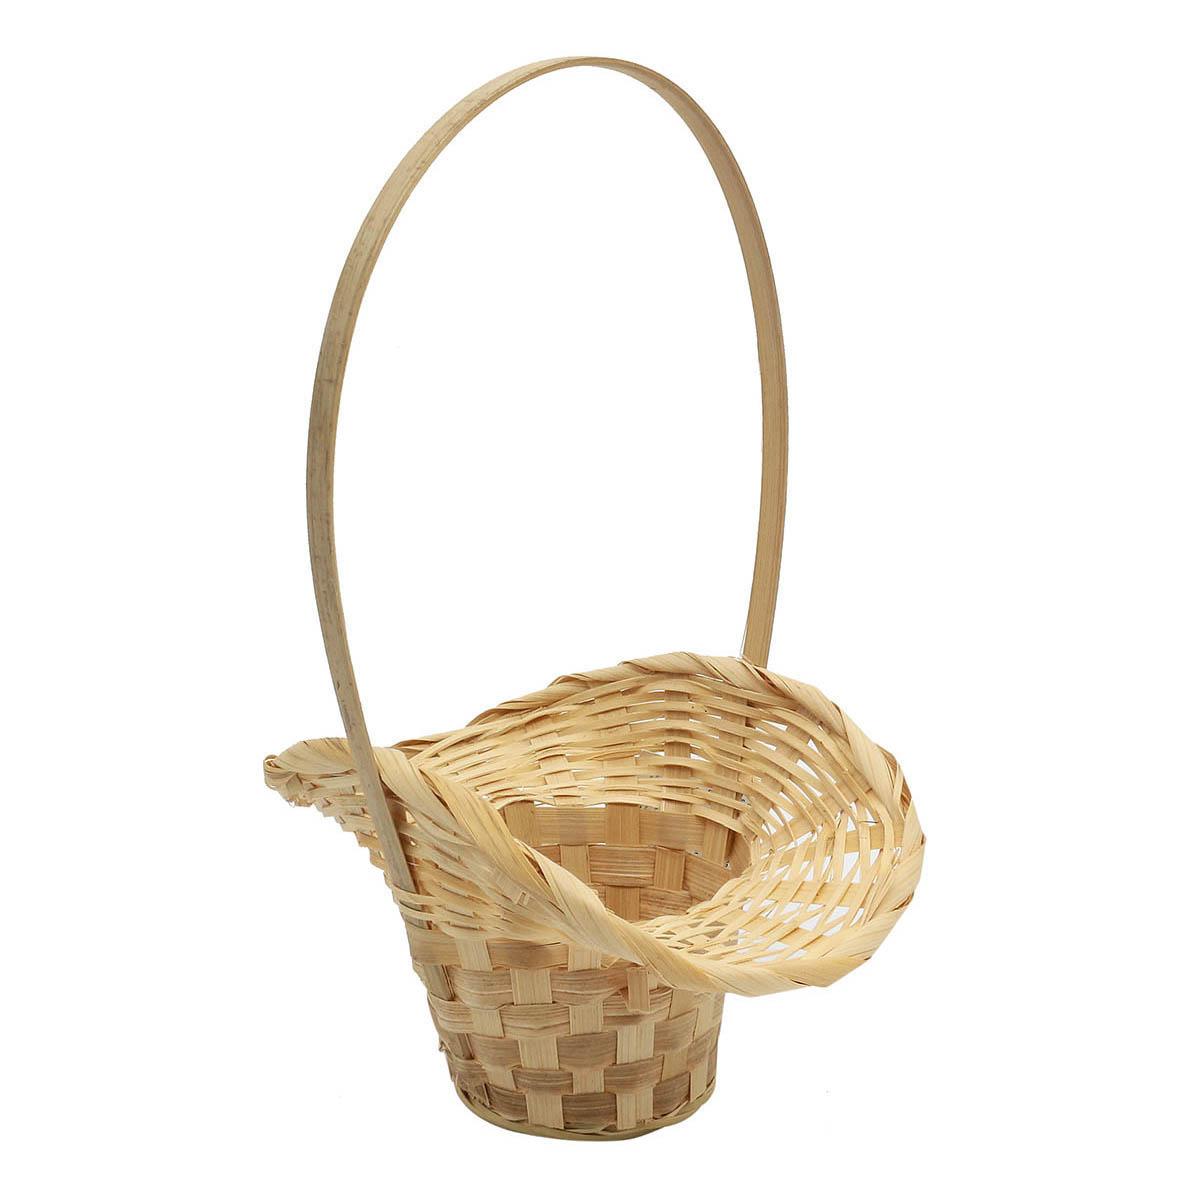 19HJ19079 Корзина плетеная бамбук 'M' 23*9*Н33см, цв. натуральный Астра